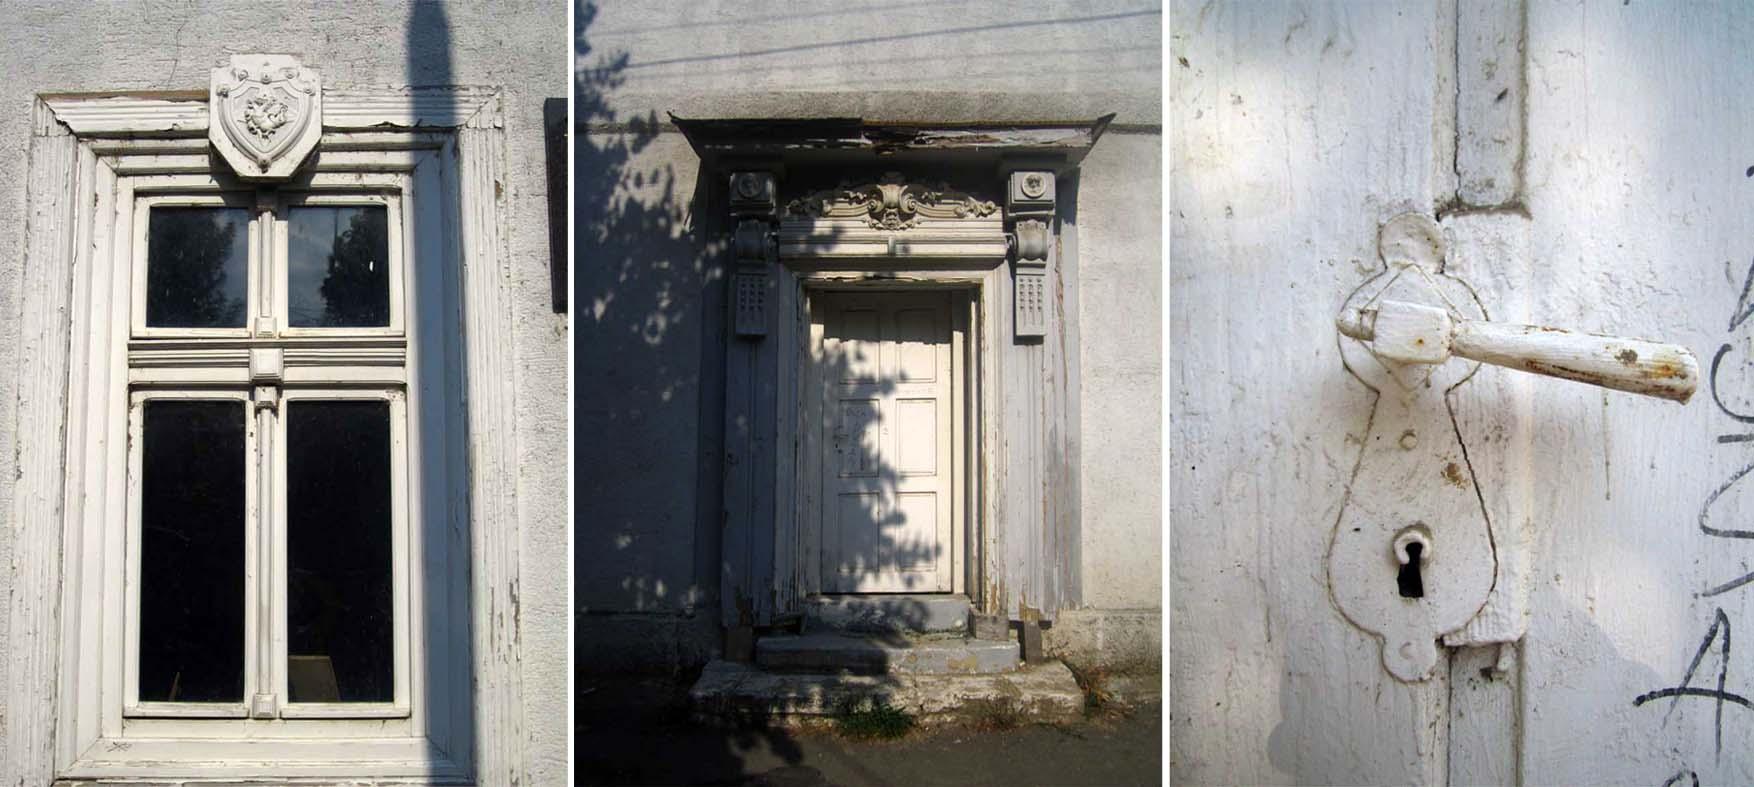 119a Bela Crkva